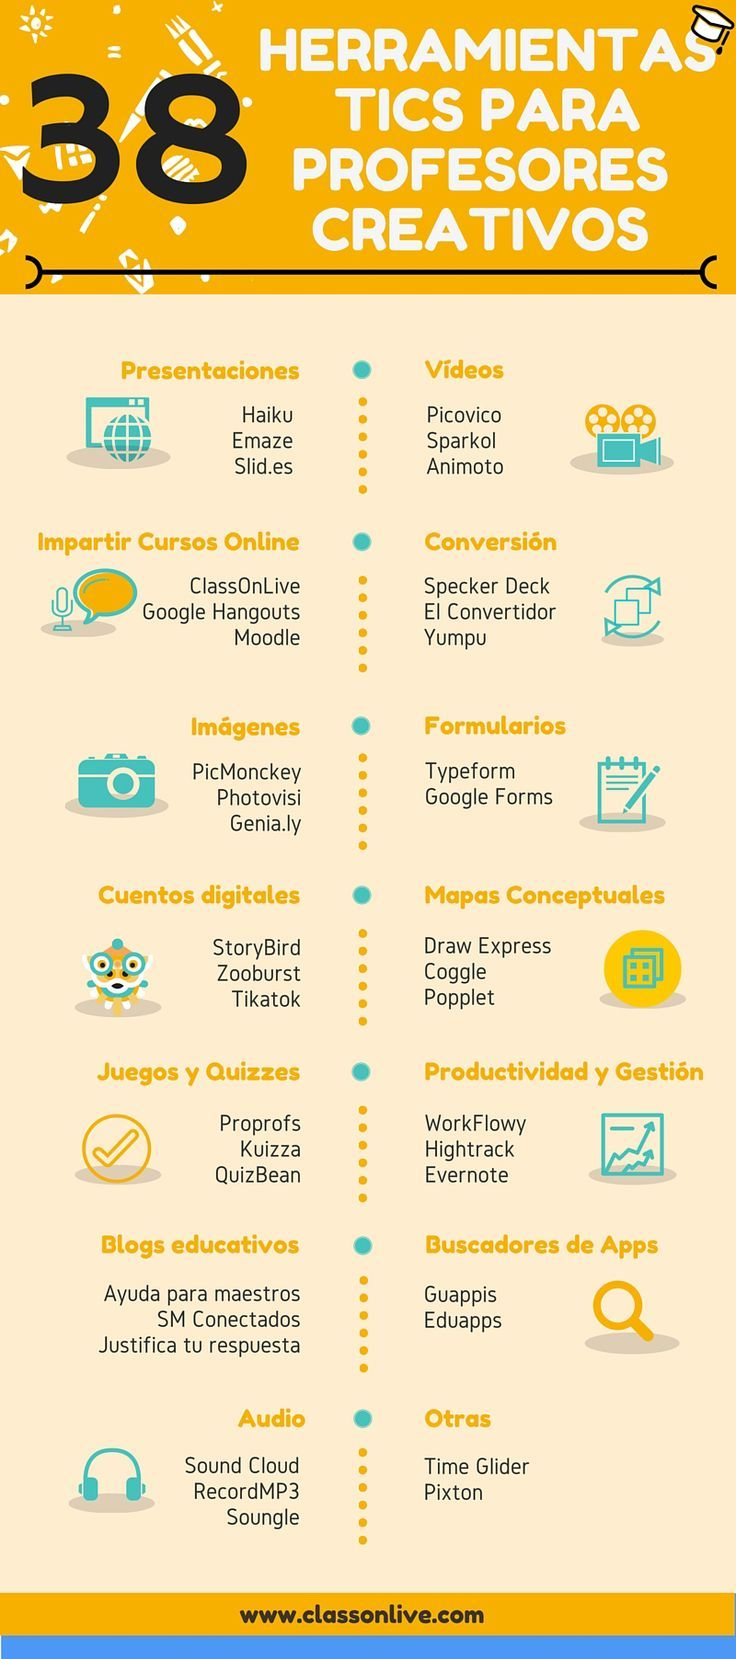 Te mostramos 38 herramientas online para hacer más dinámicas tus clases #infografias #infographic